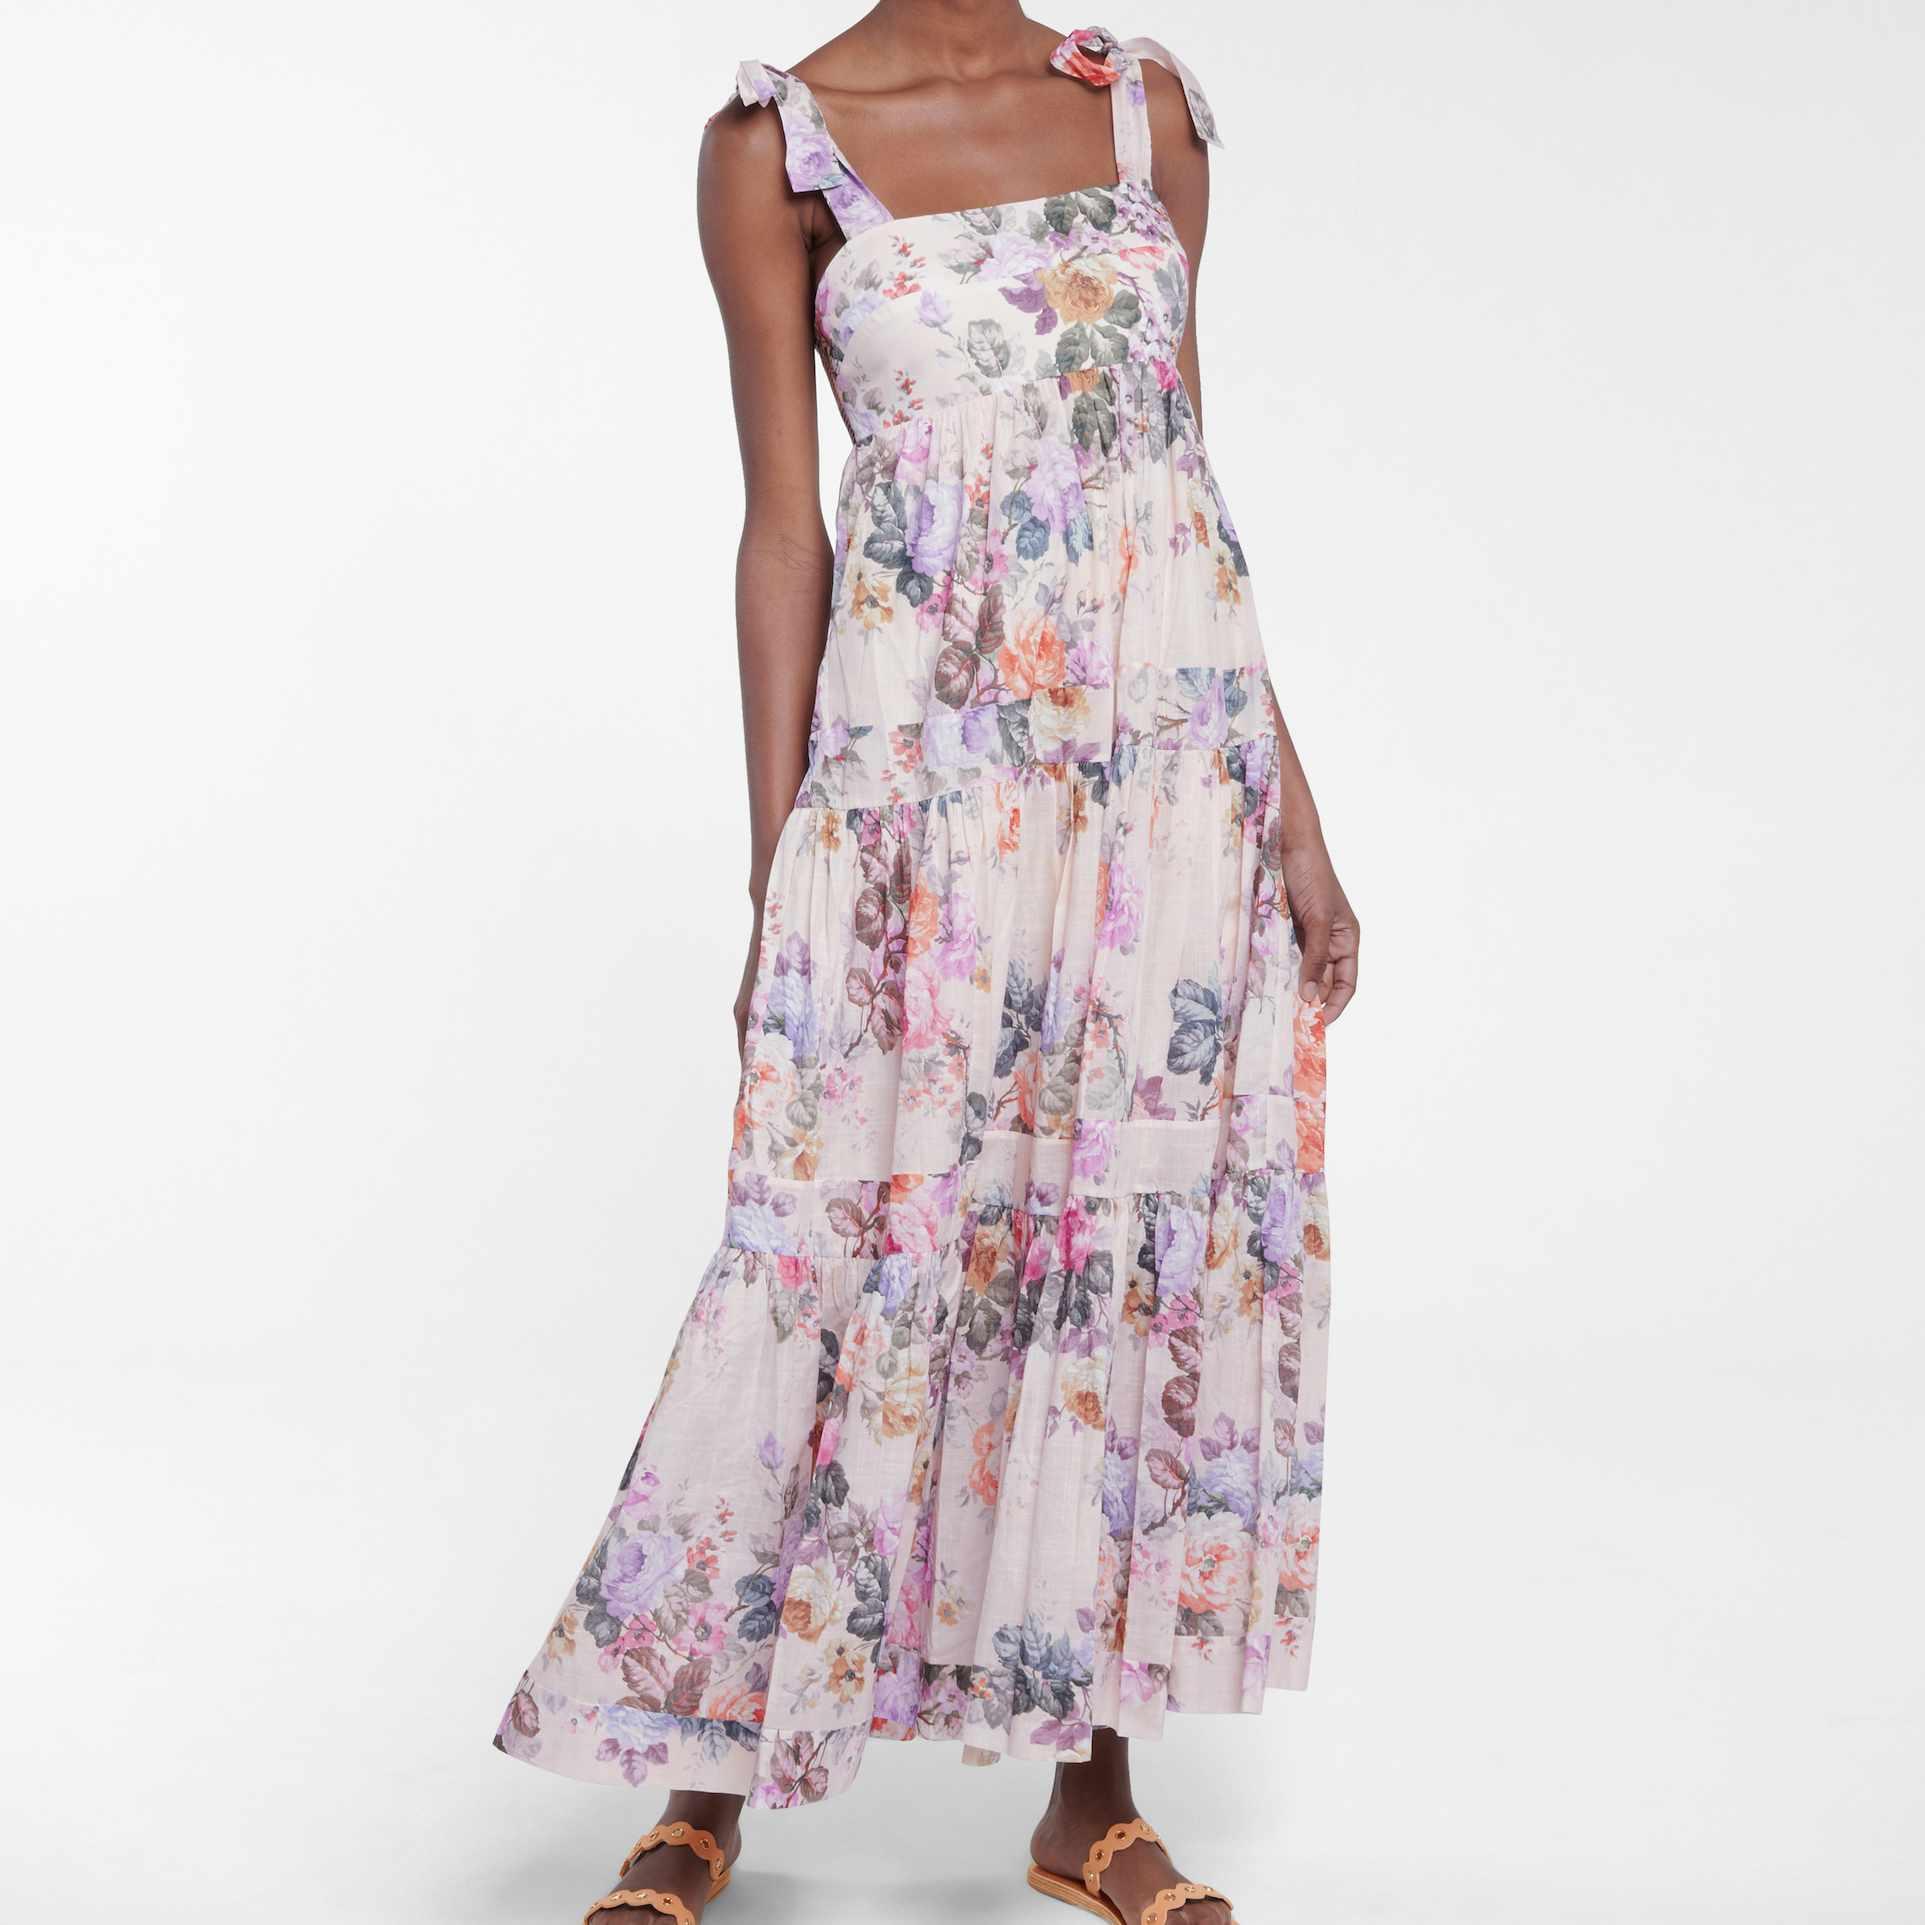 Zimmermann Brighton Floral Cotton Midi Dress, $700, on sale $650